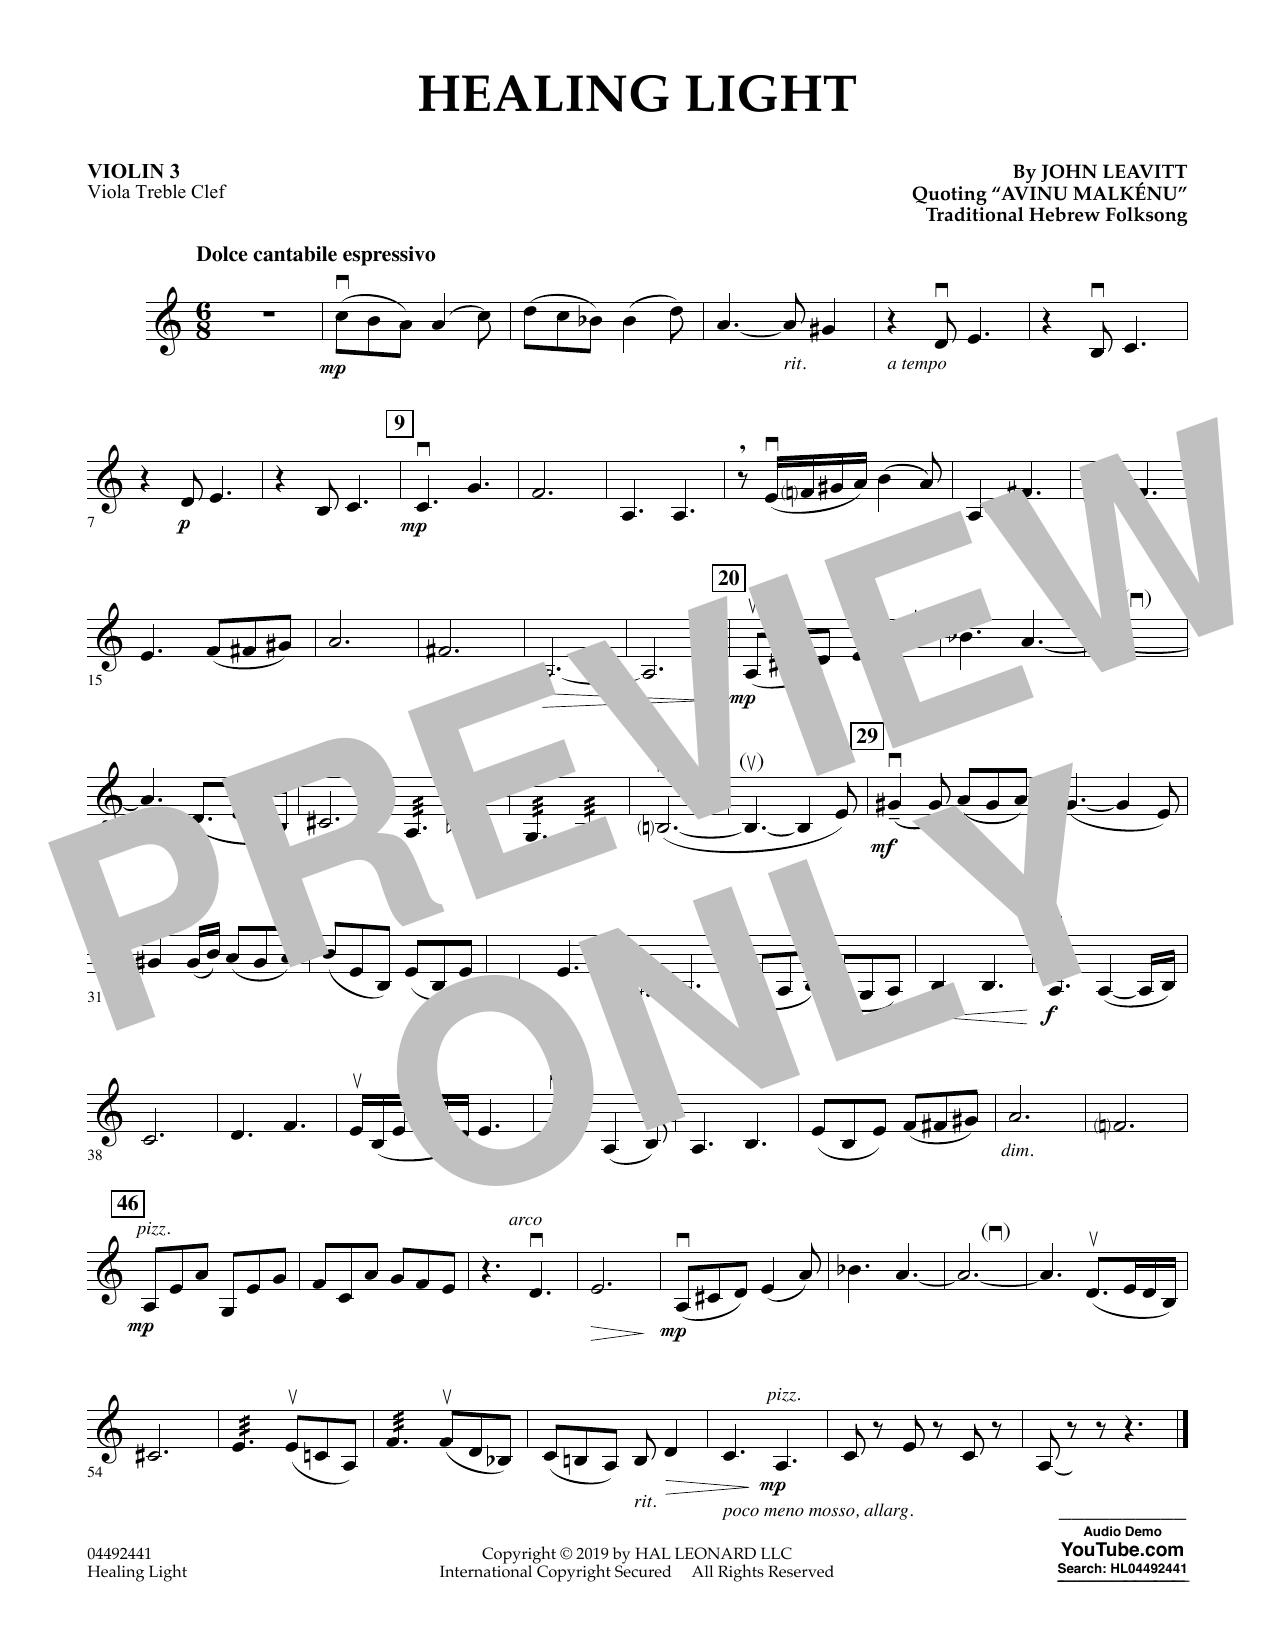 Healing Light - Violin 3 (Viola Treble Clef) (Orchestra)